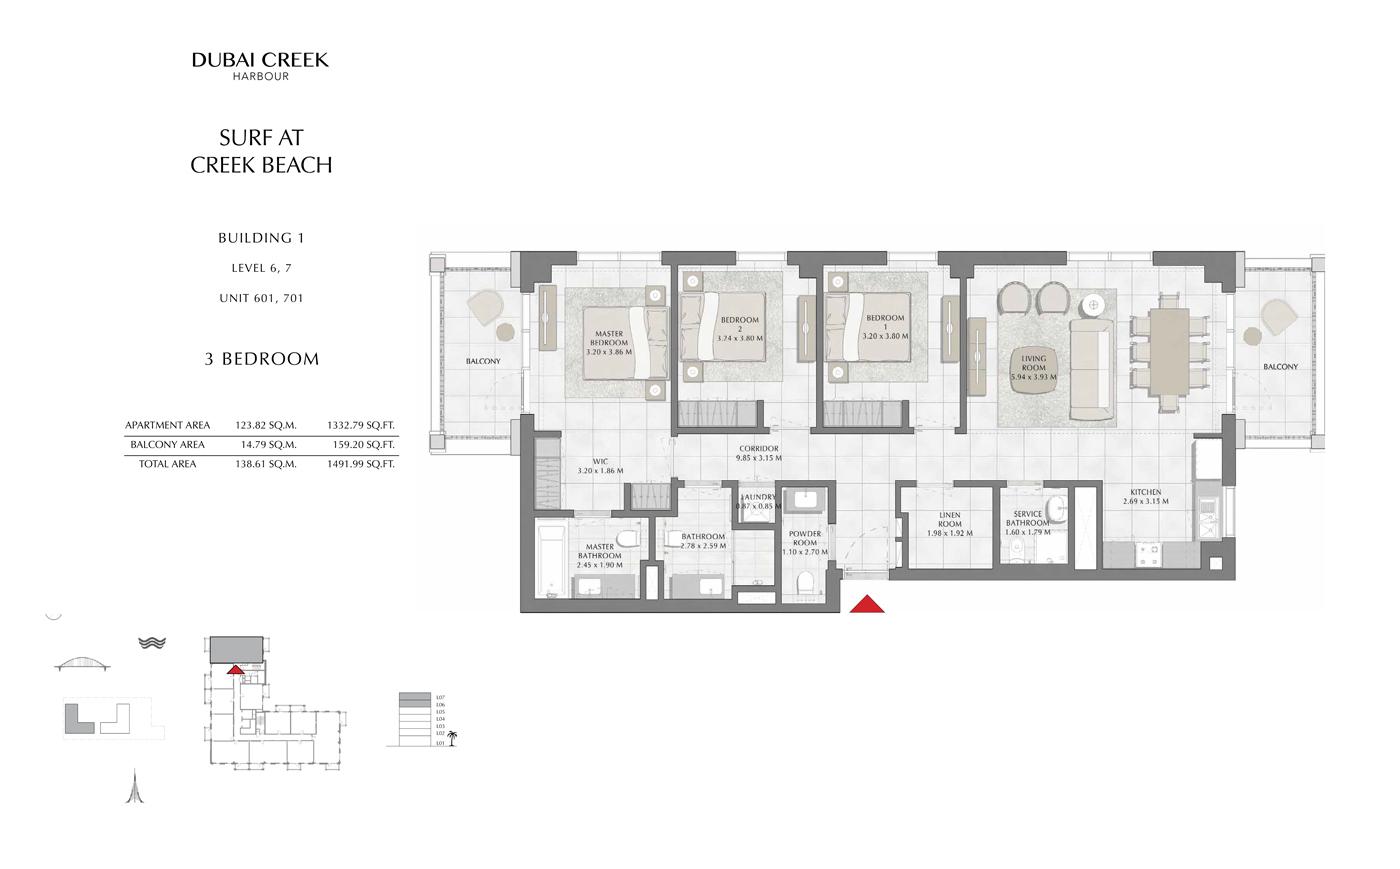 Building 1, 3 Bedroom, Level 6,7, Size 1491 Sq Ft